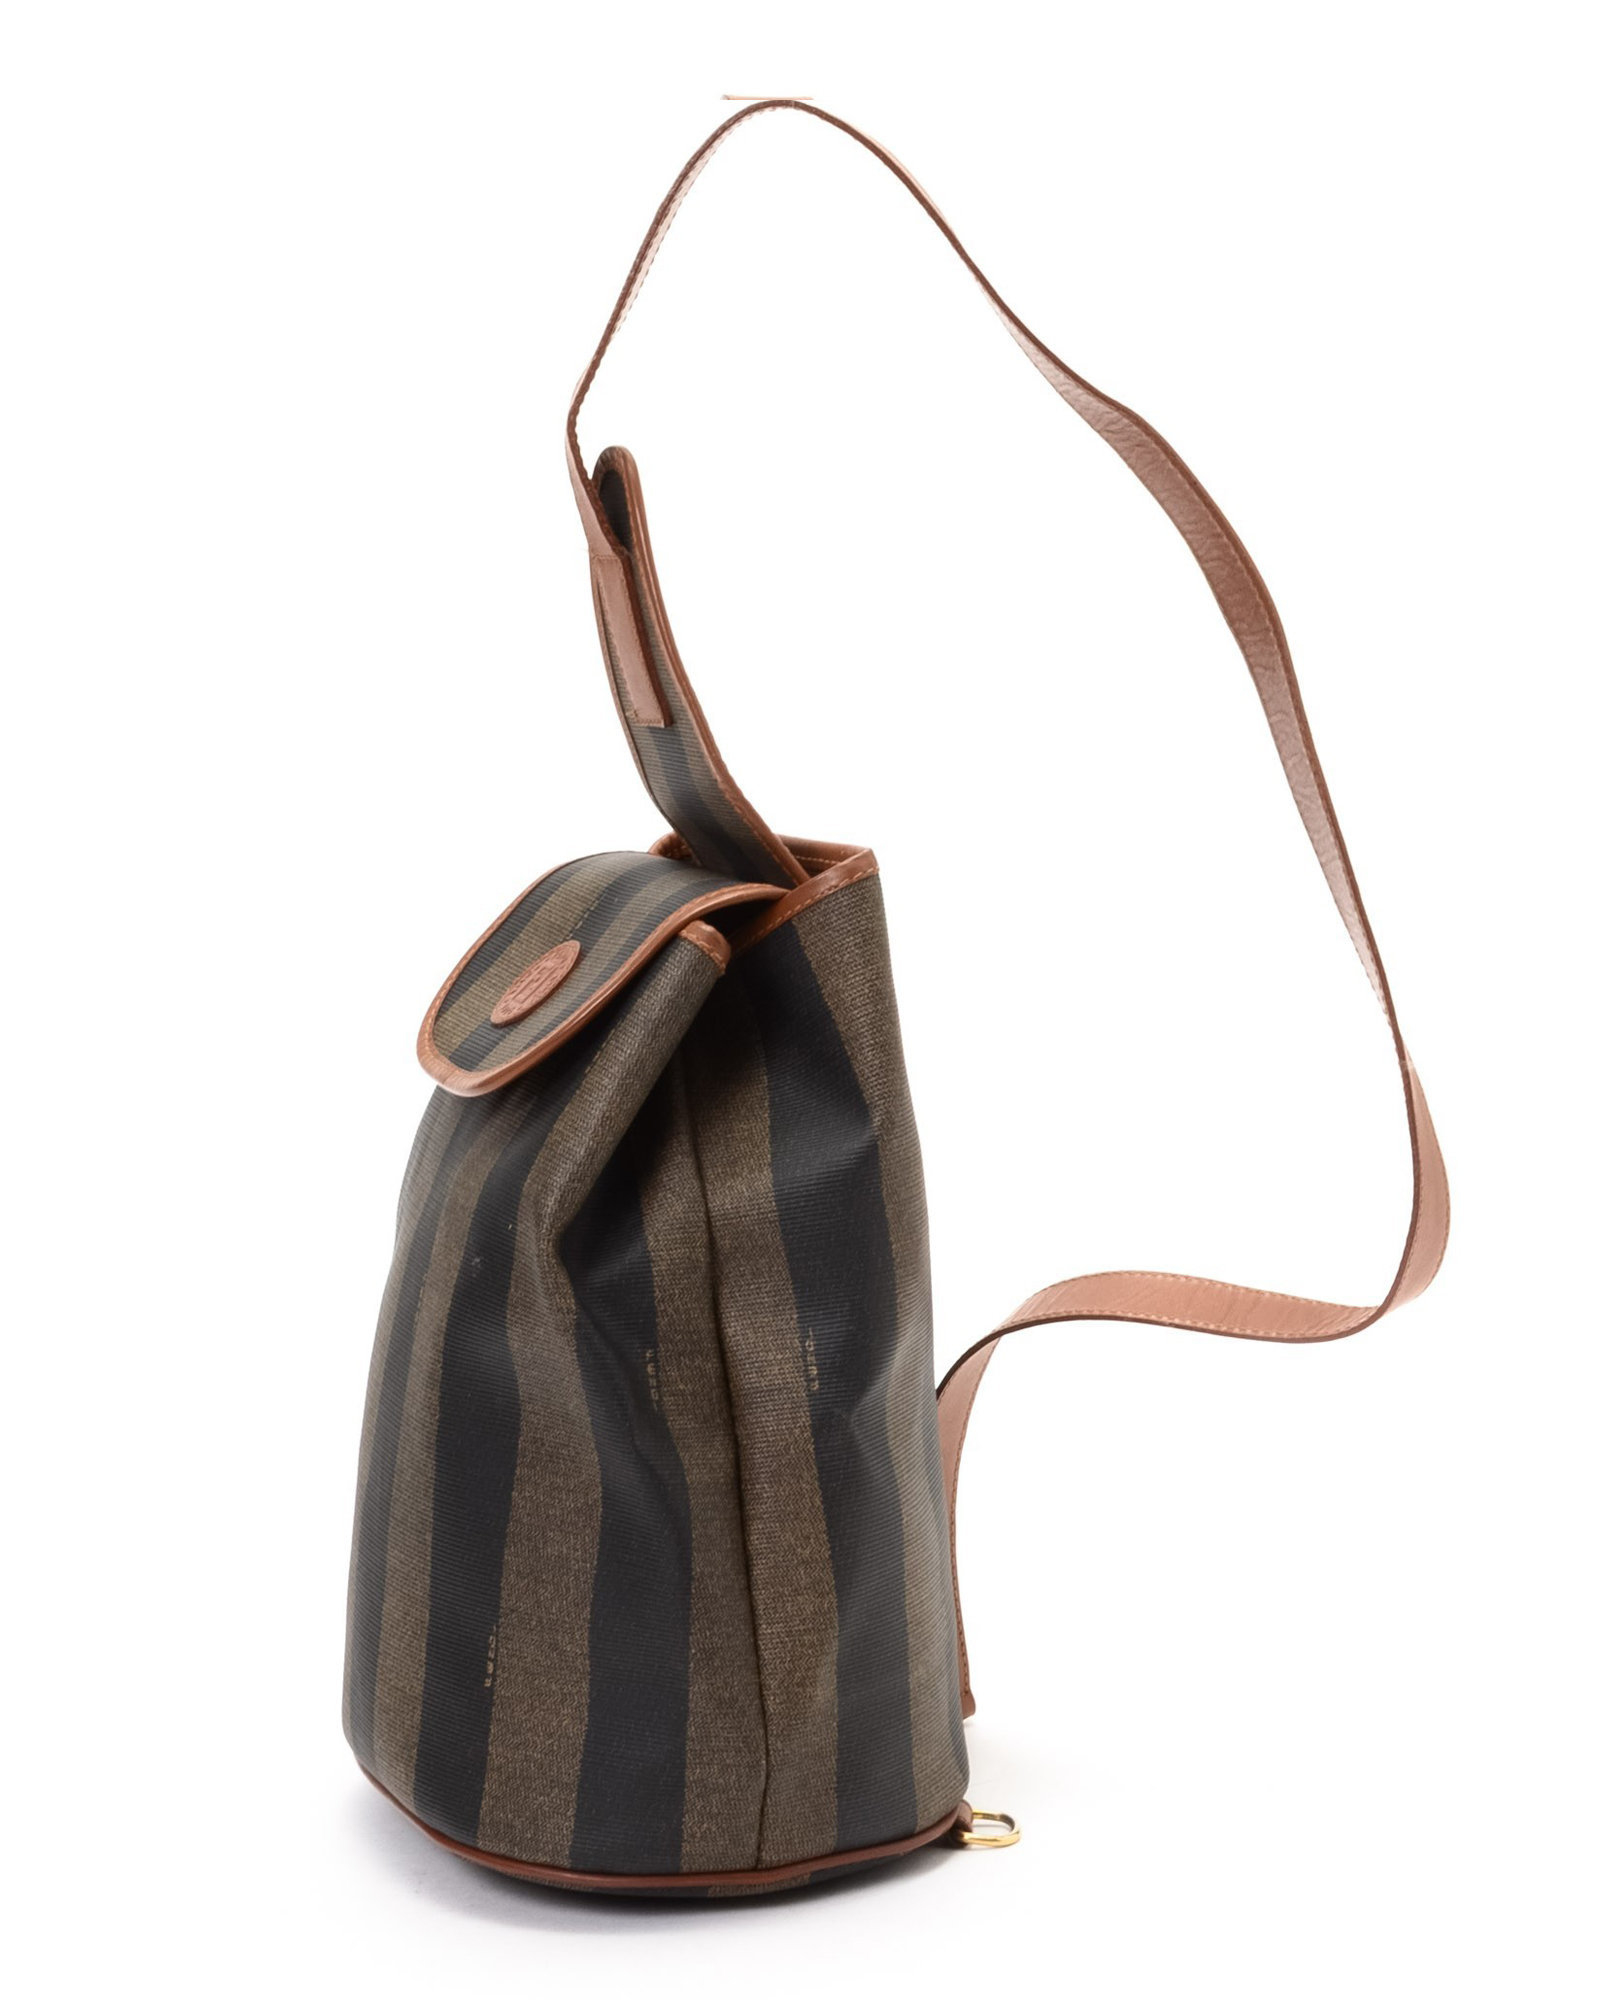 Lyst - Fendi Brown Backpack - Vintage in Black b5014aef5f18e